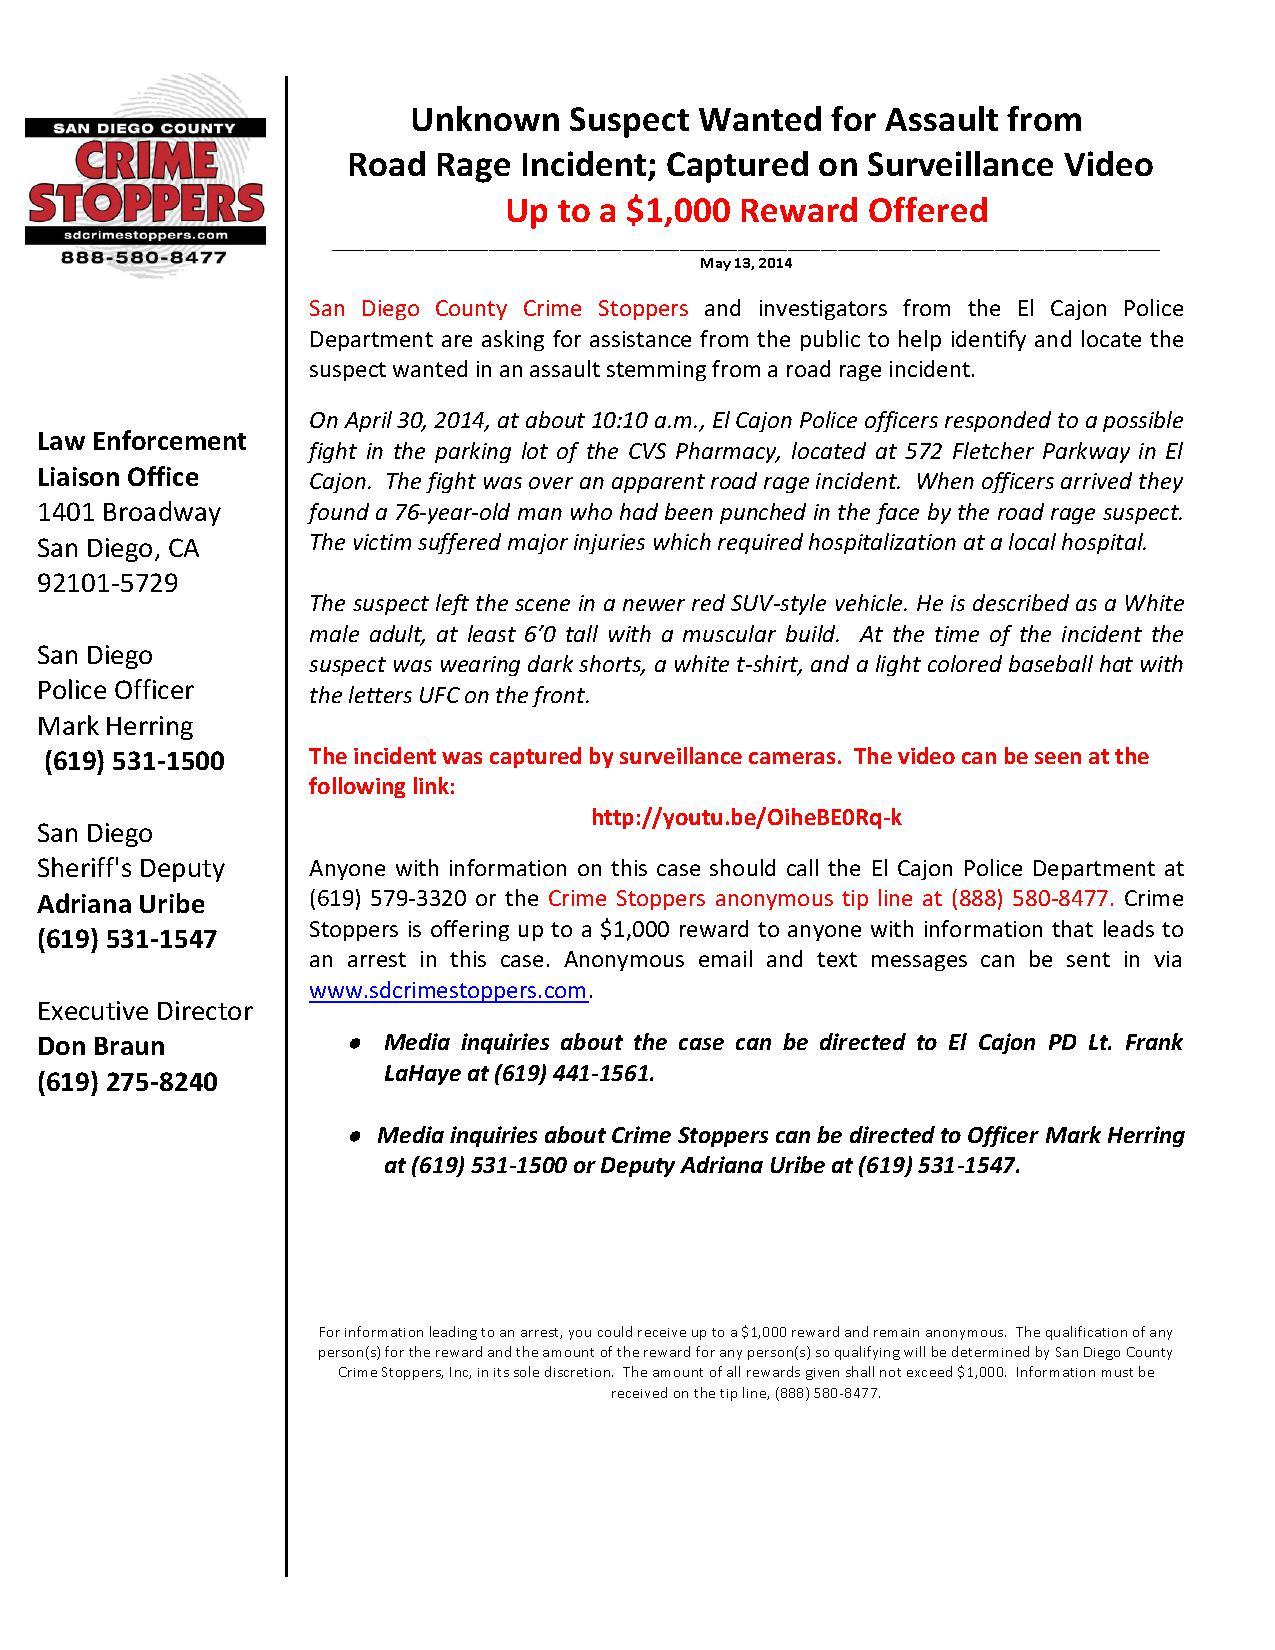 051314 El Cajon Road Rage Incident_1